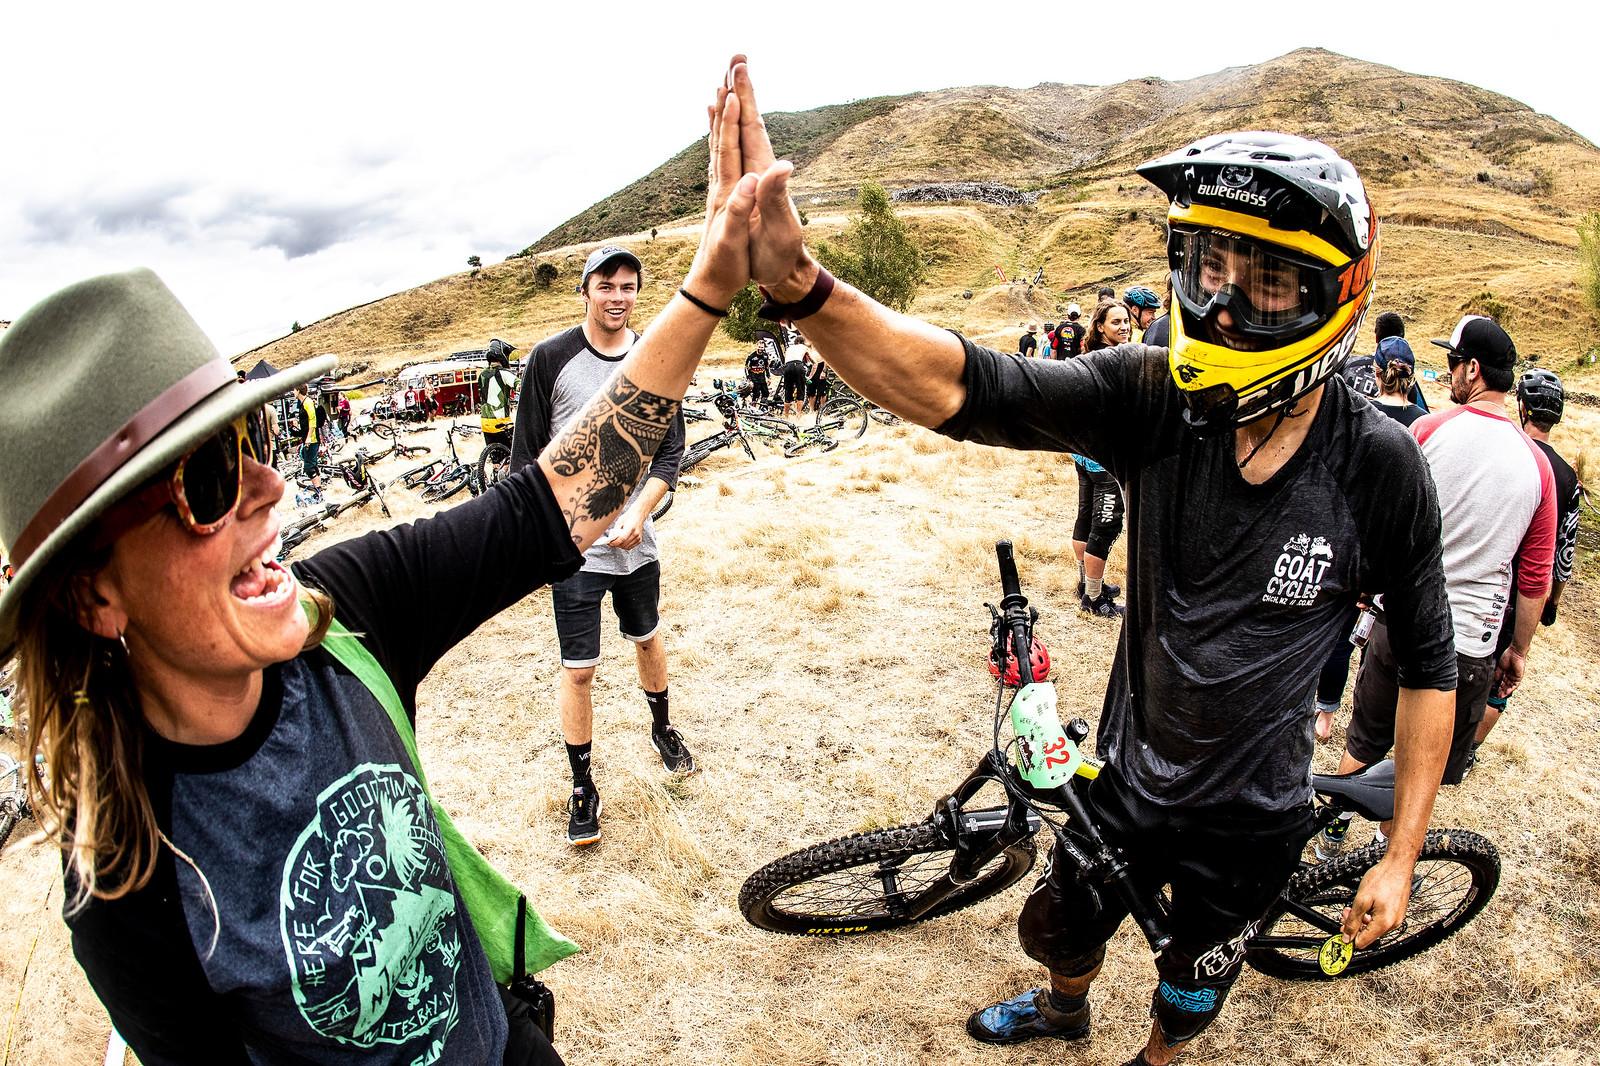 NZEnduro19  m1 9666 - 2019 NZ Enduro Day 3 Photo Gallery - Mountain Biking Pictures - Vital MTB